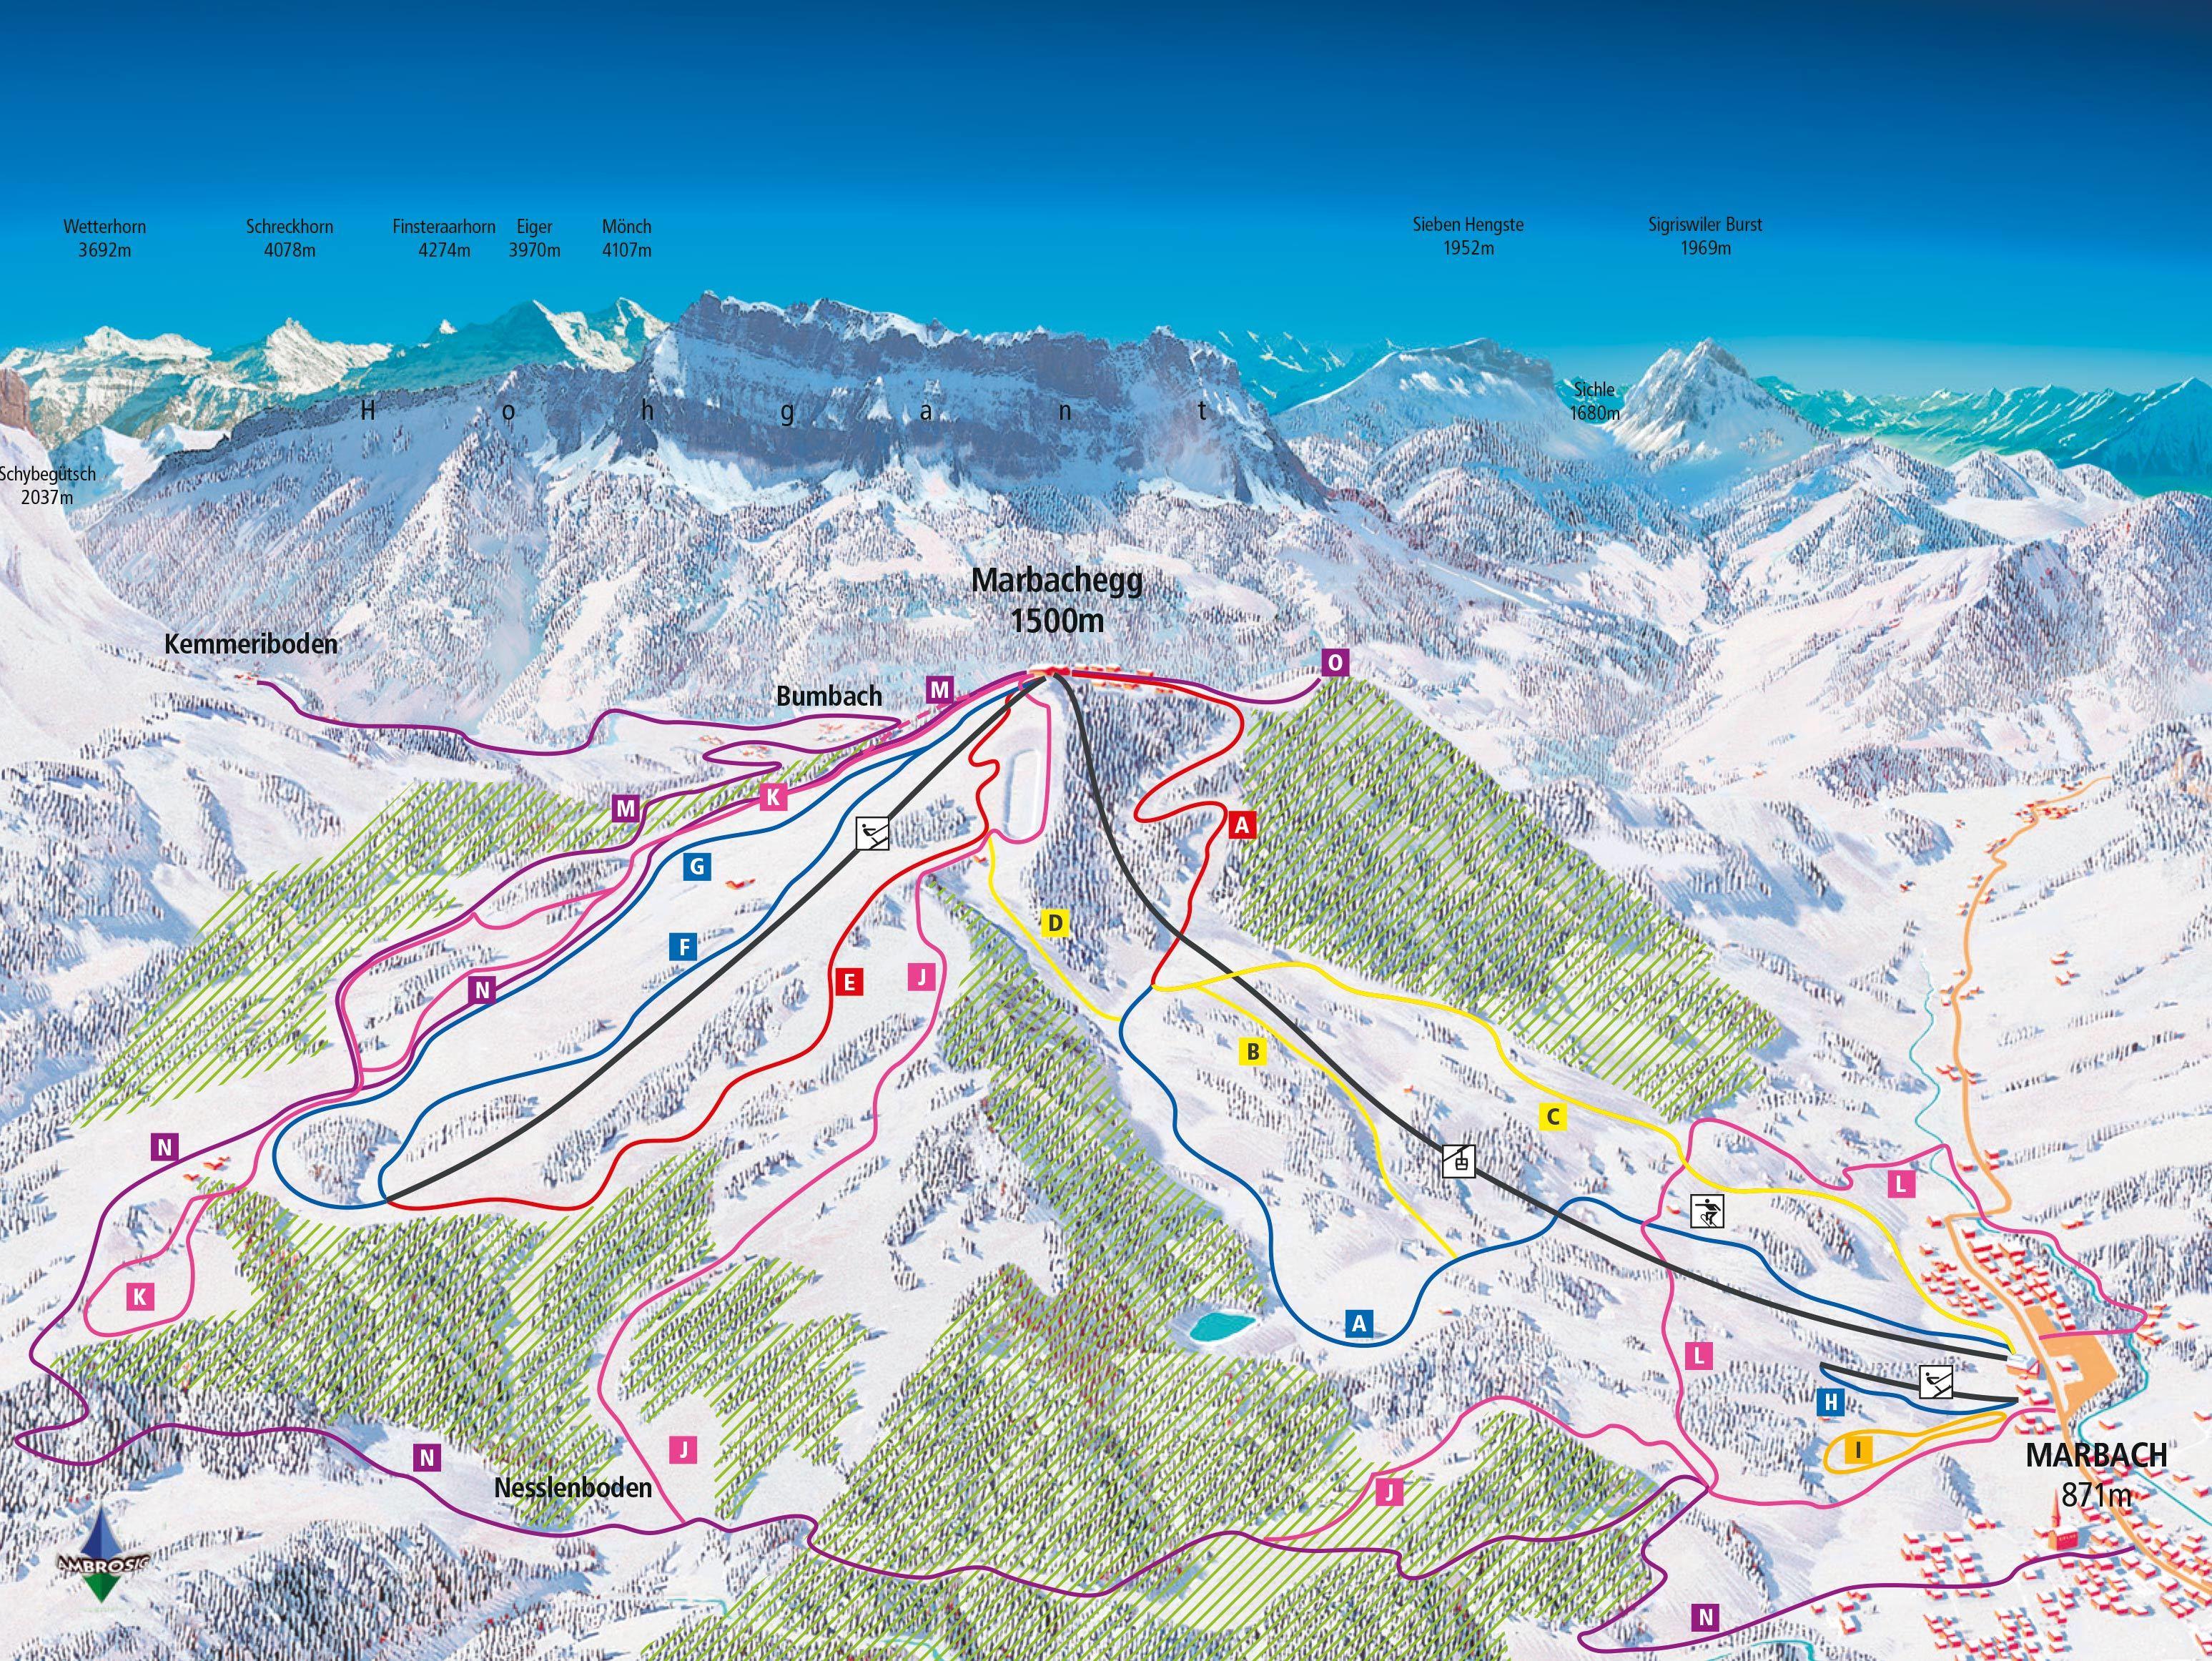 Marbach - Marbachegg Trail Map | OnTheSnow